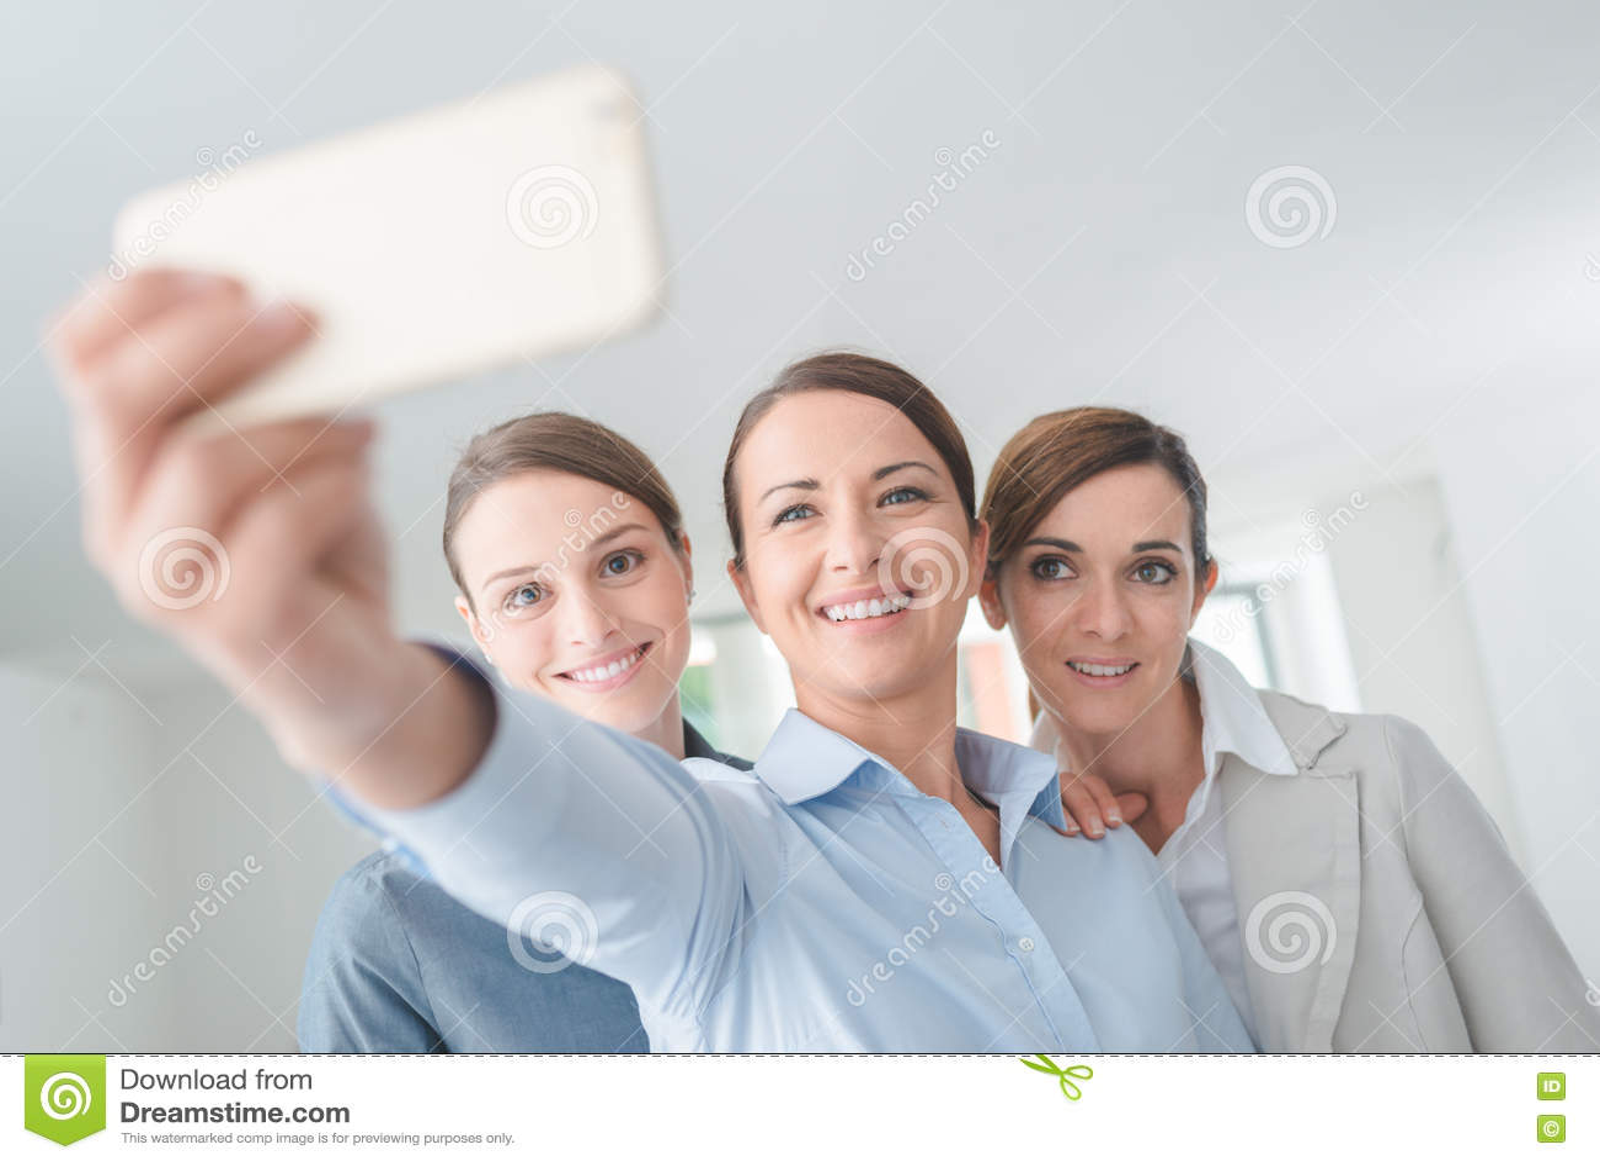 Smiling business women team taking a selfie